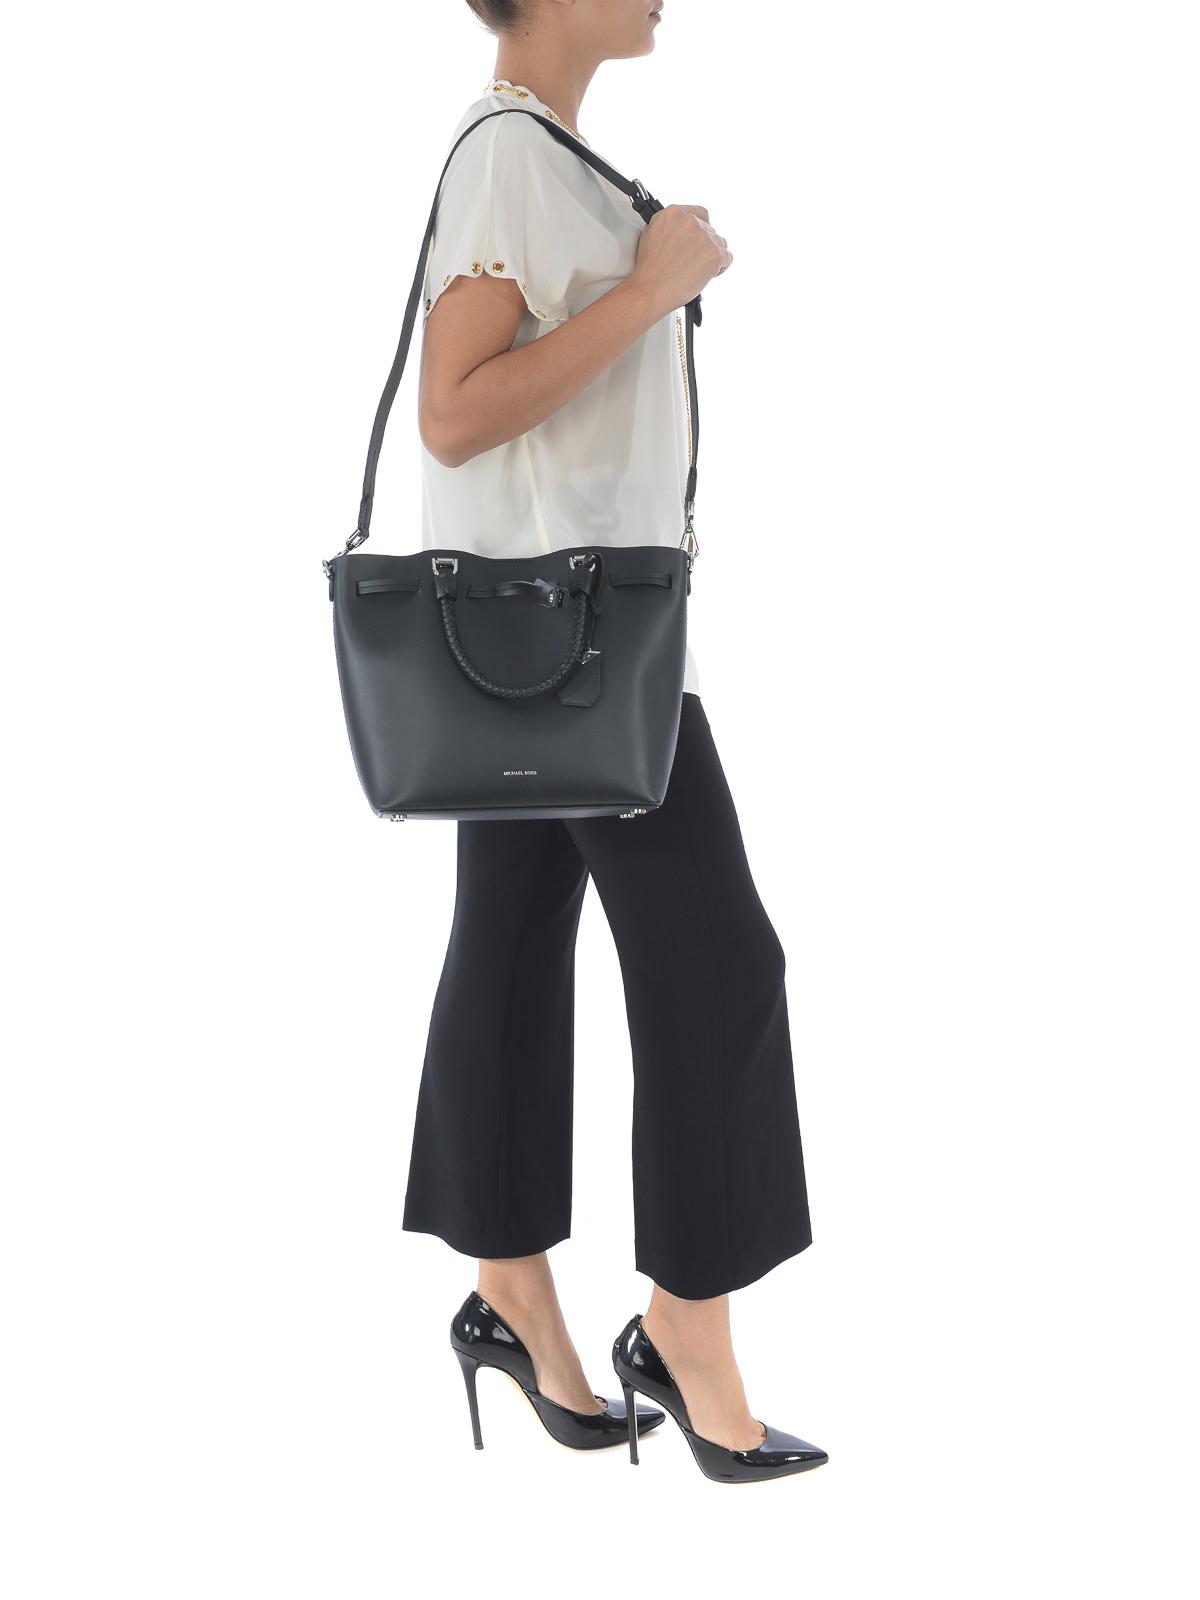 8950f3cca19644 Michael Kors - Blakely M black leather bucket bag - Bucket bags ...